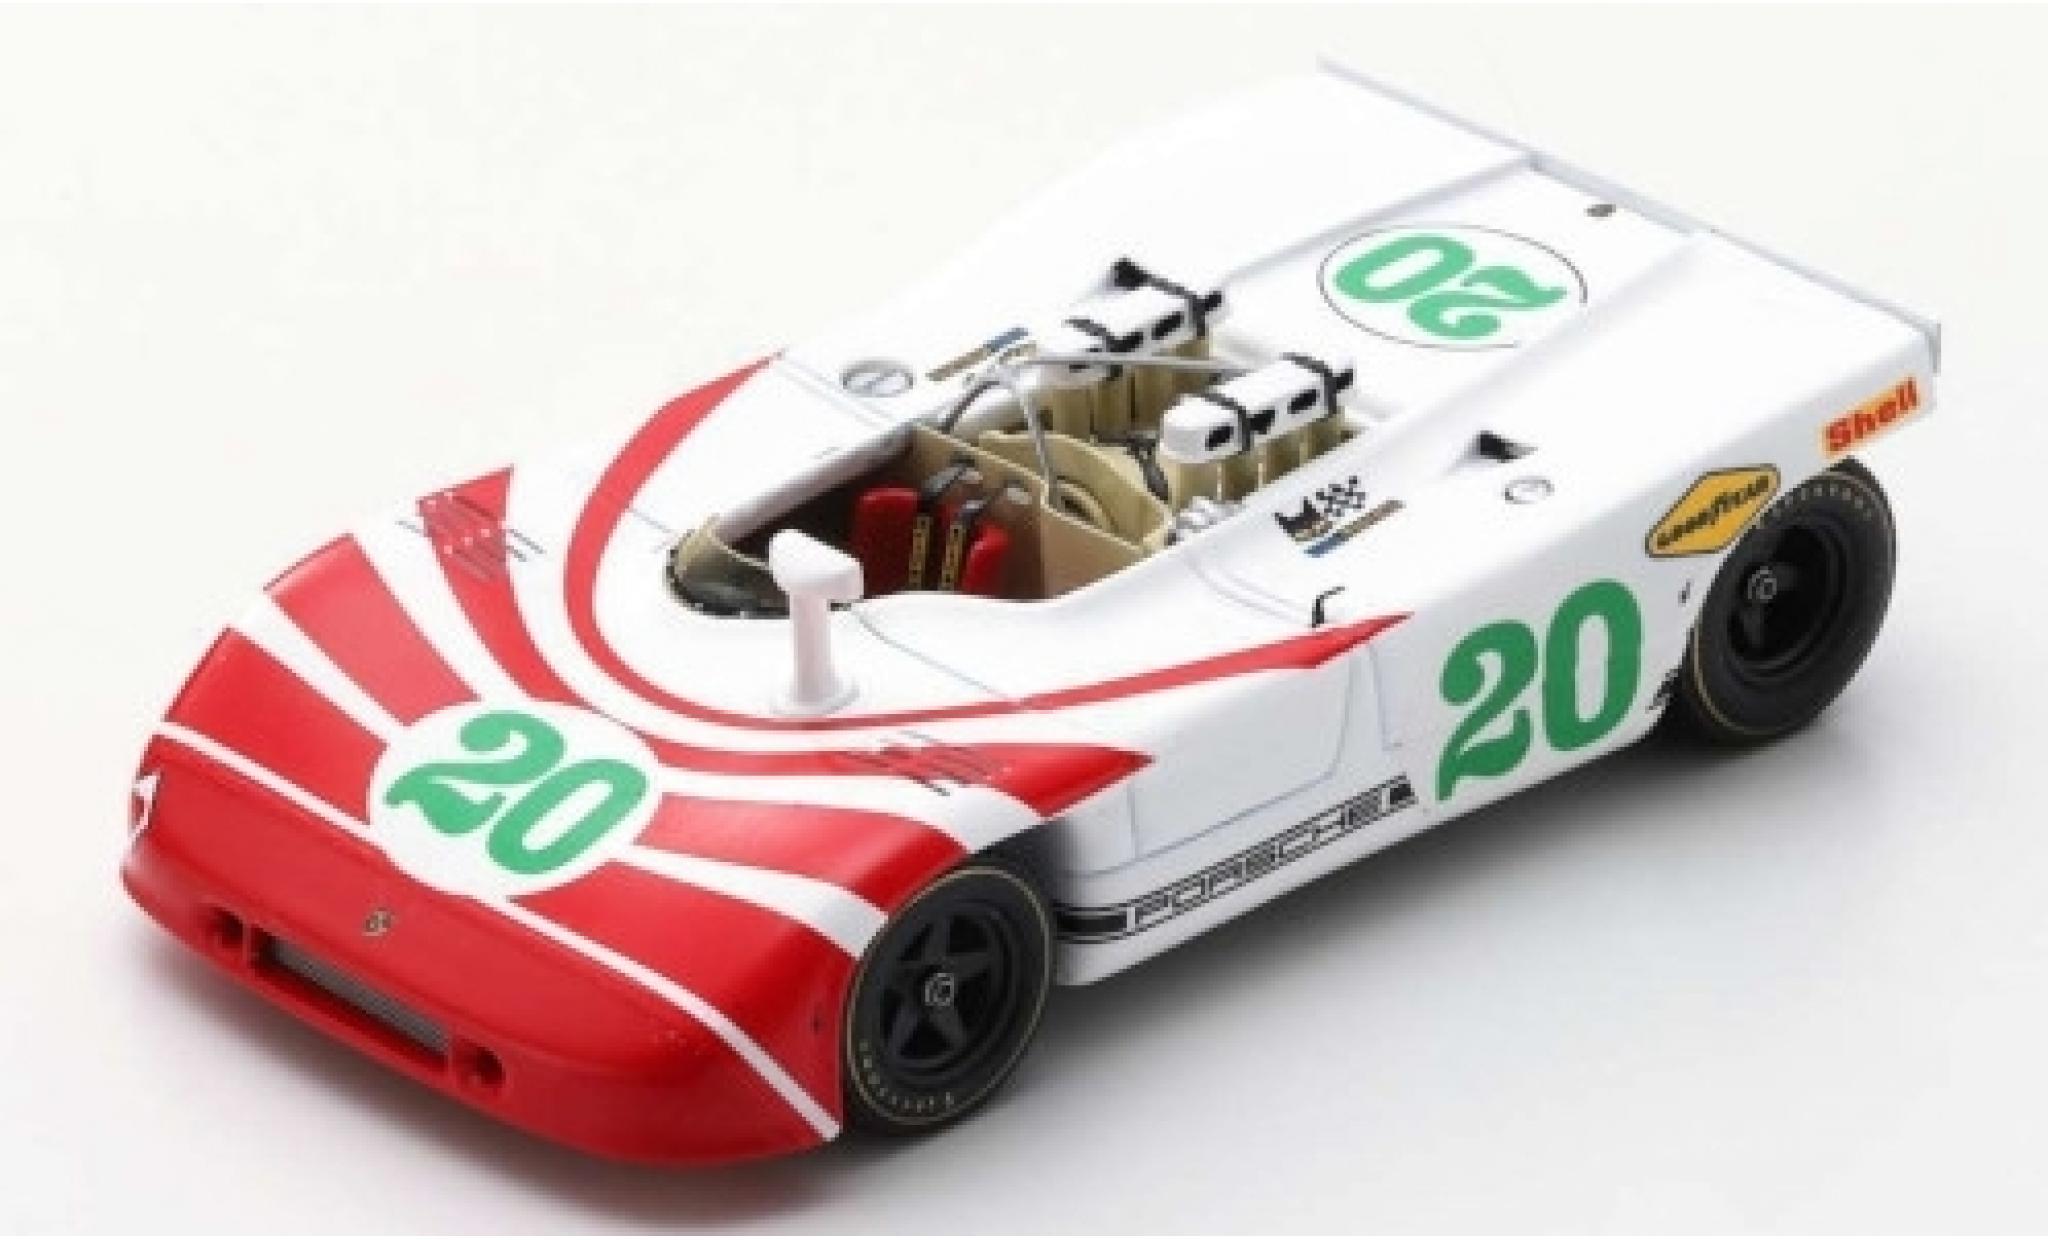 Porsche 908 1970 1/43 Spark /03 RHD No.20 Salzburg Targa Florio V.Elford/H.Herrmann